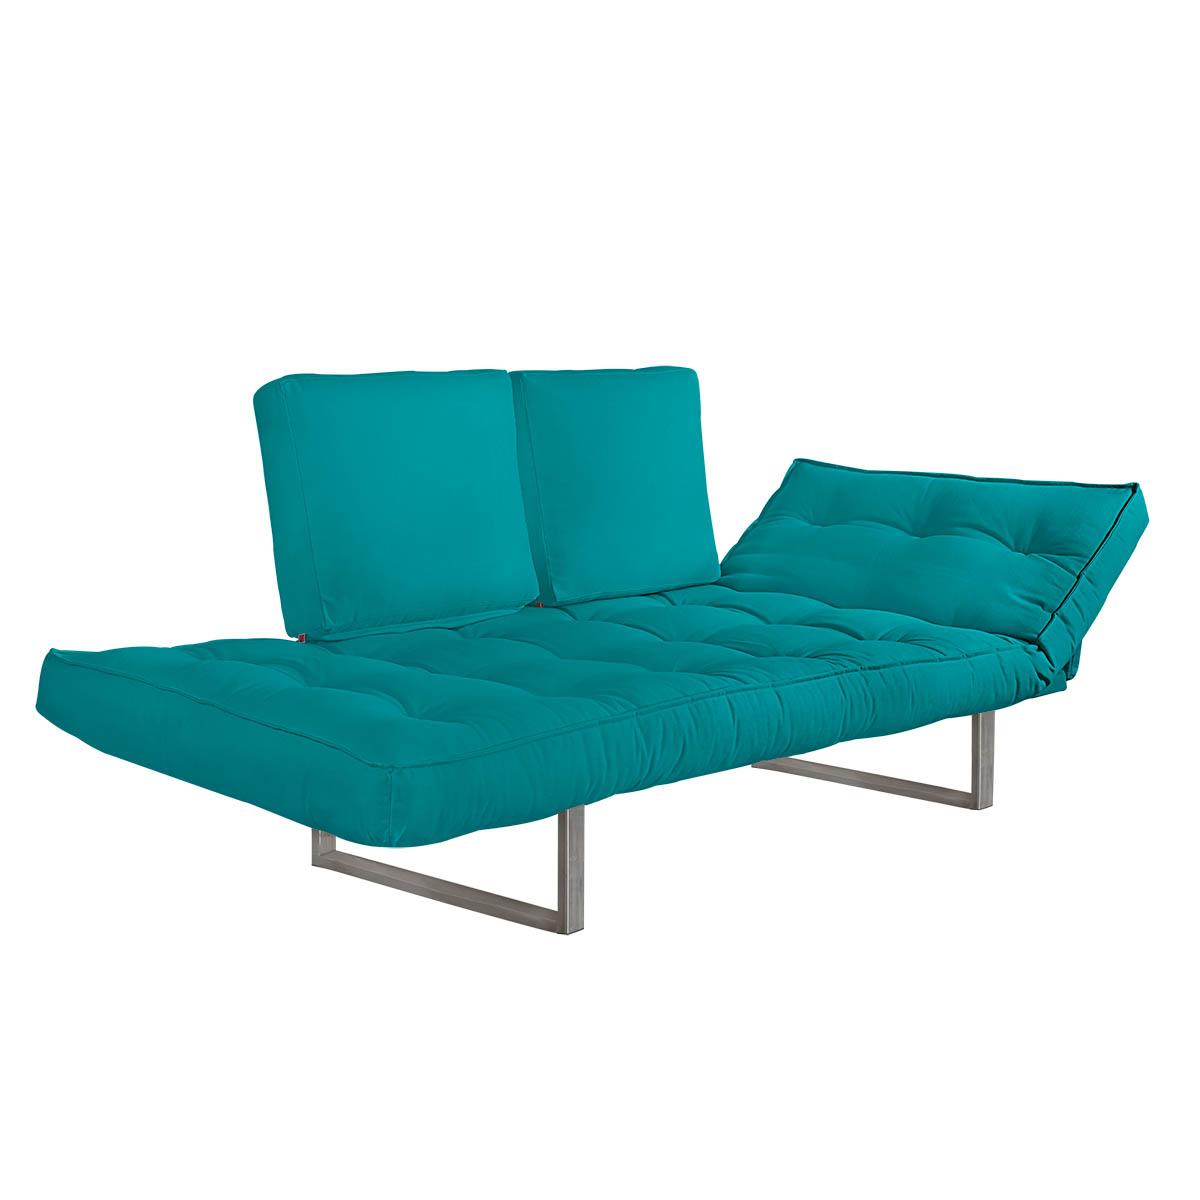 Sofa cama solteiro futon company for Sofa cama individual